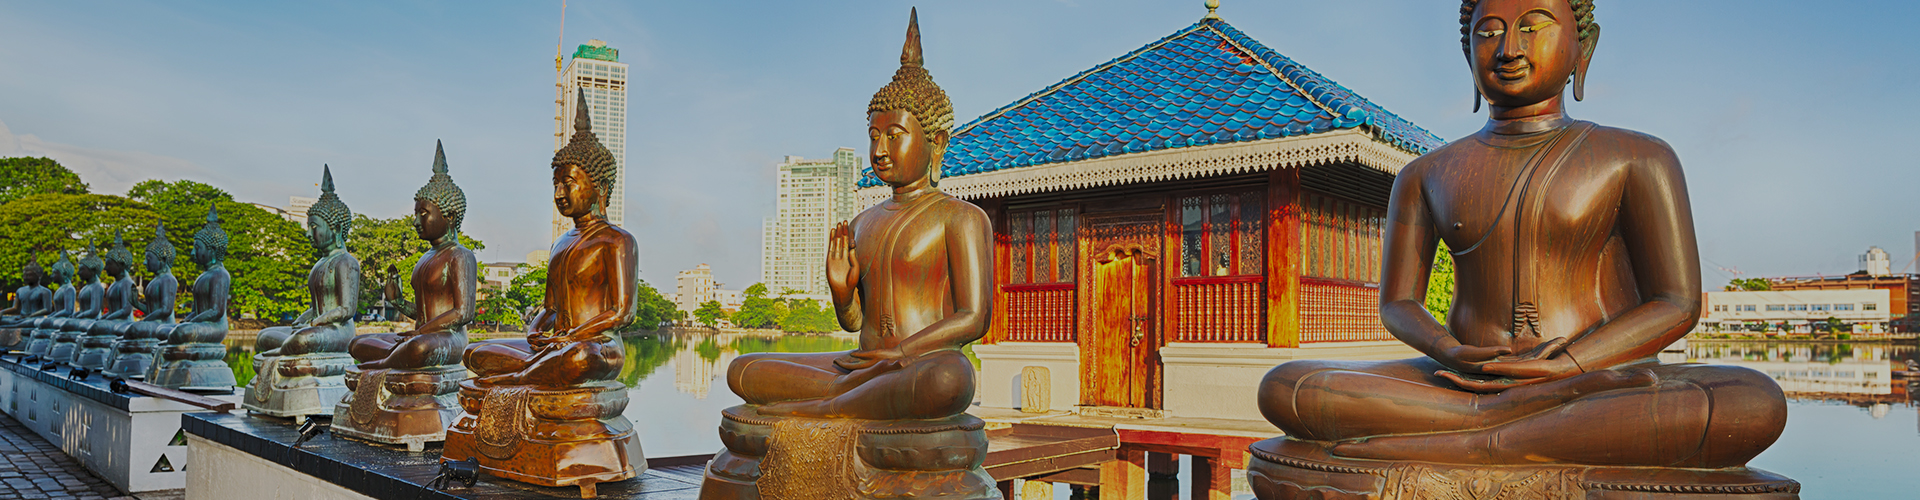 Landmark photograph of Sri Lanka